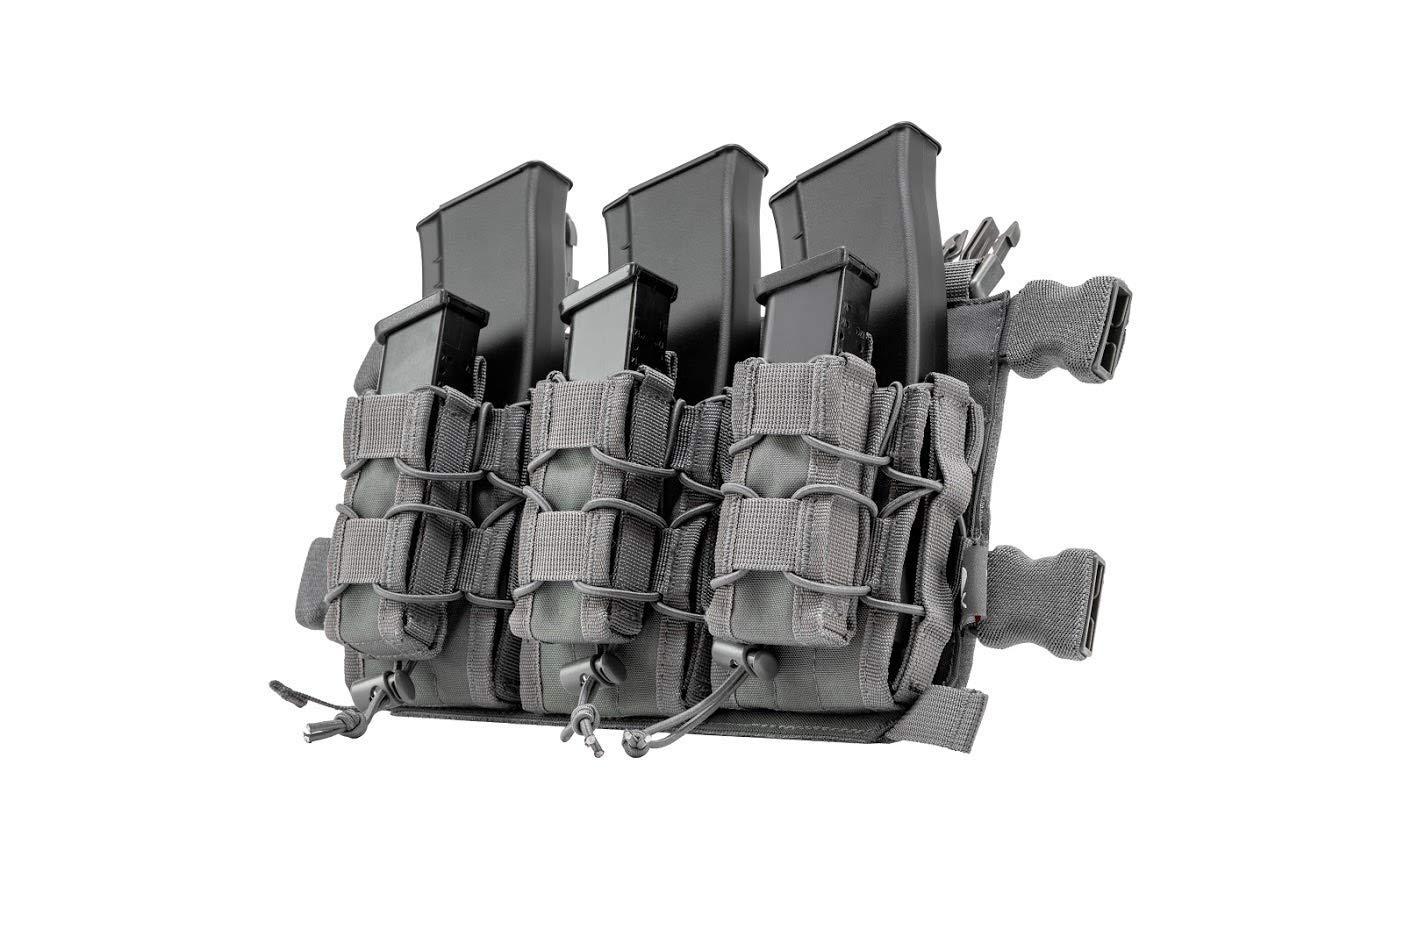 Viper TACTICAL VX Buckle Up Inserto modulare portacaricatori